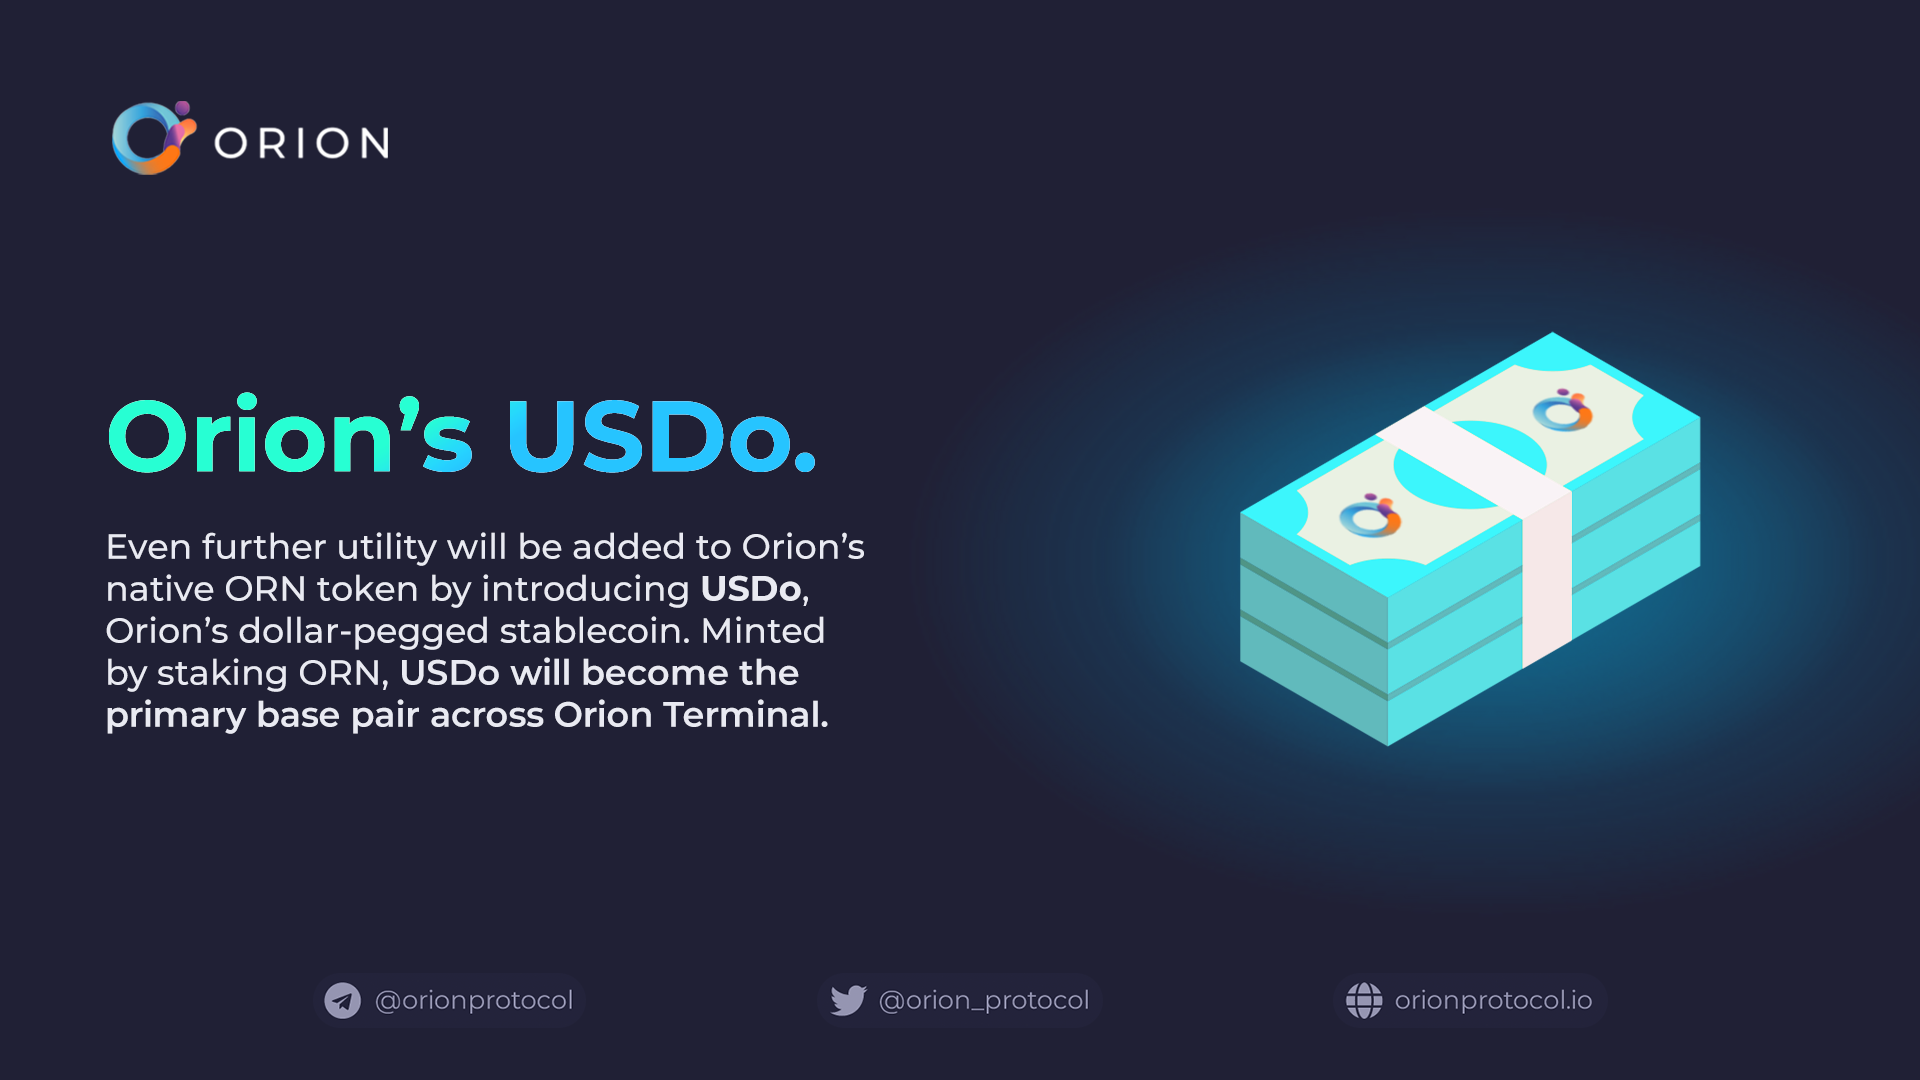 USDo: Orion's Stablecoin